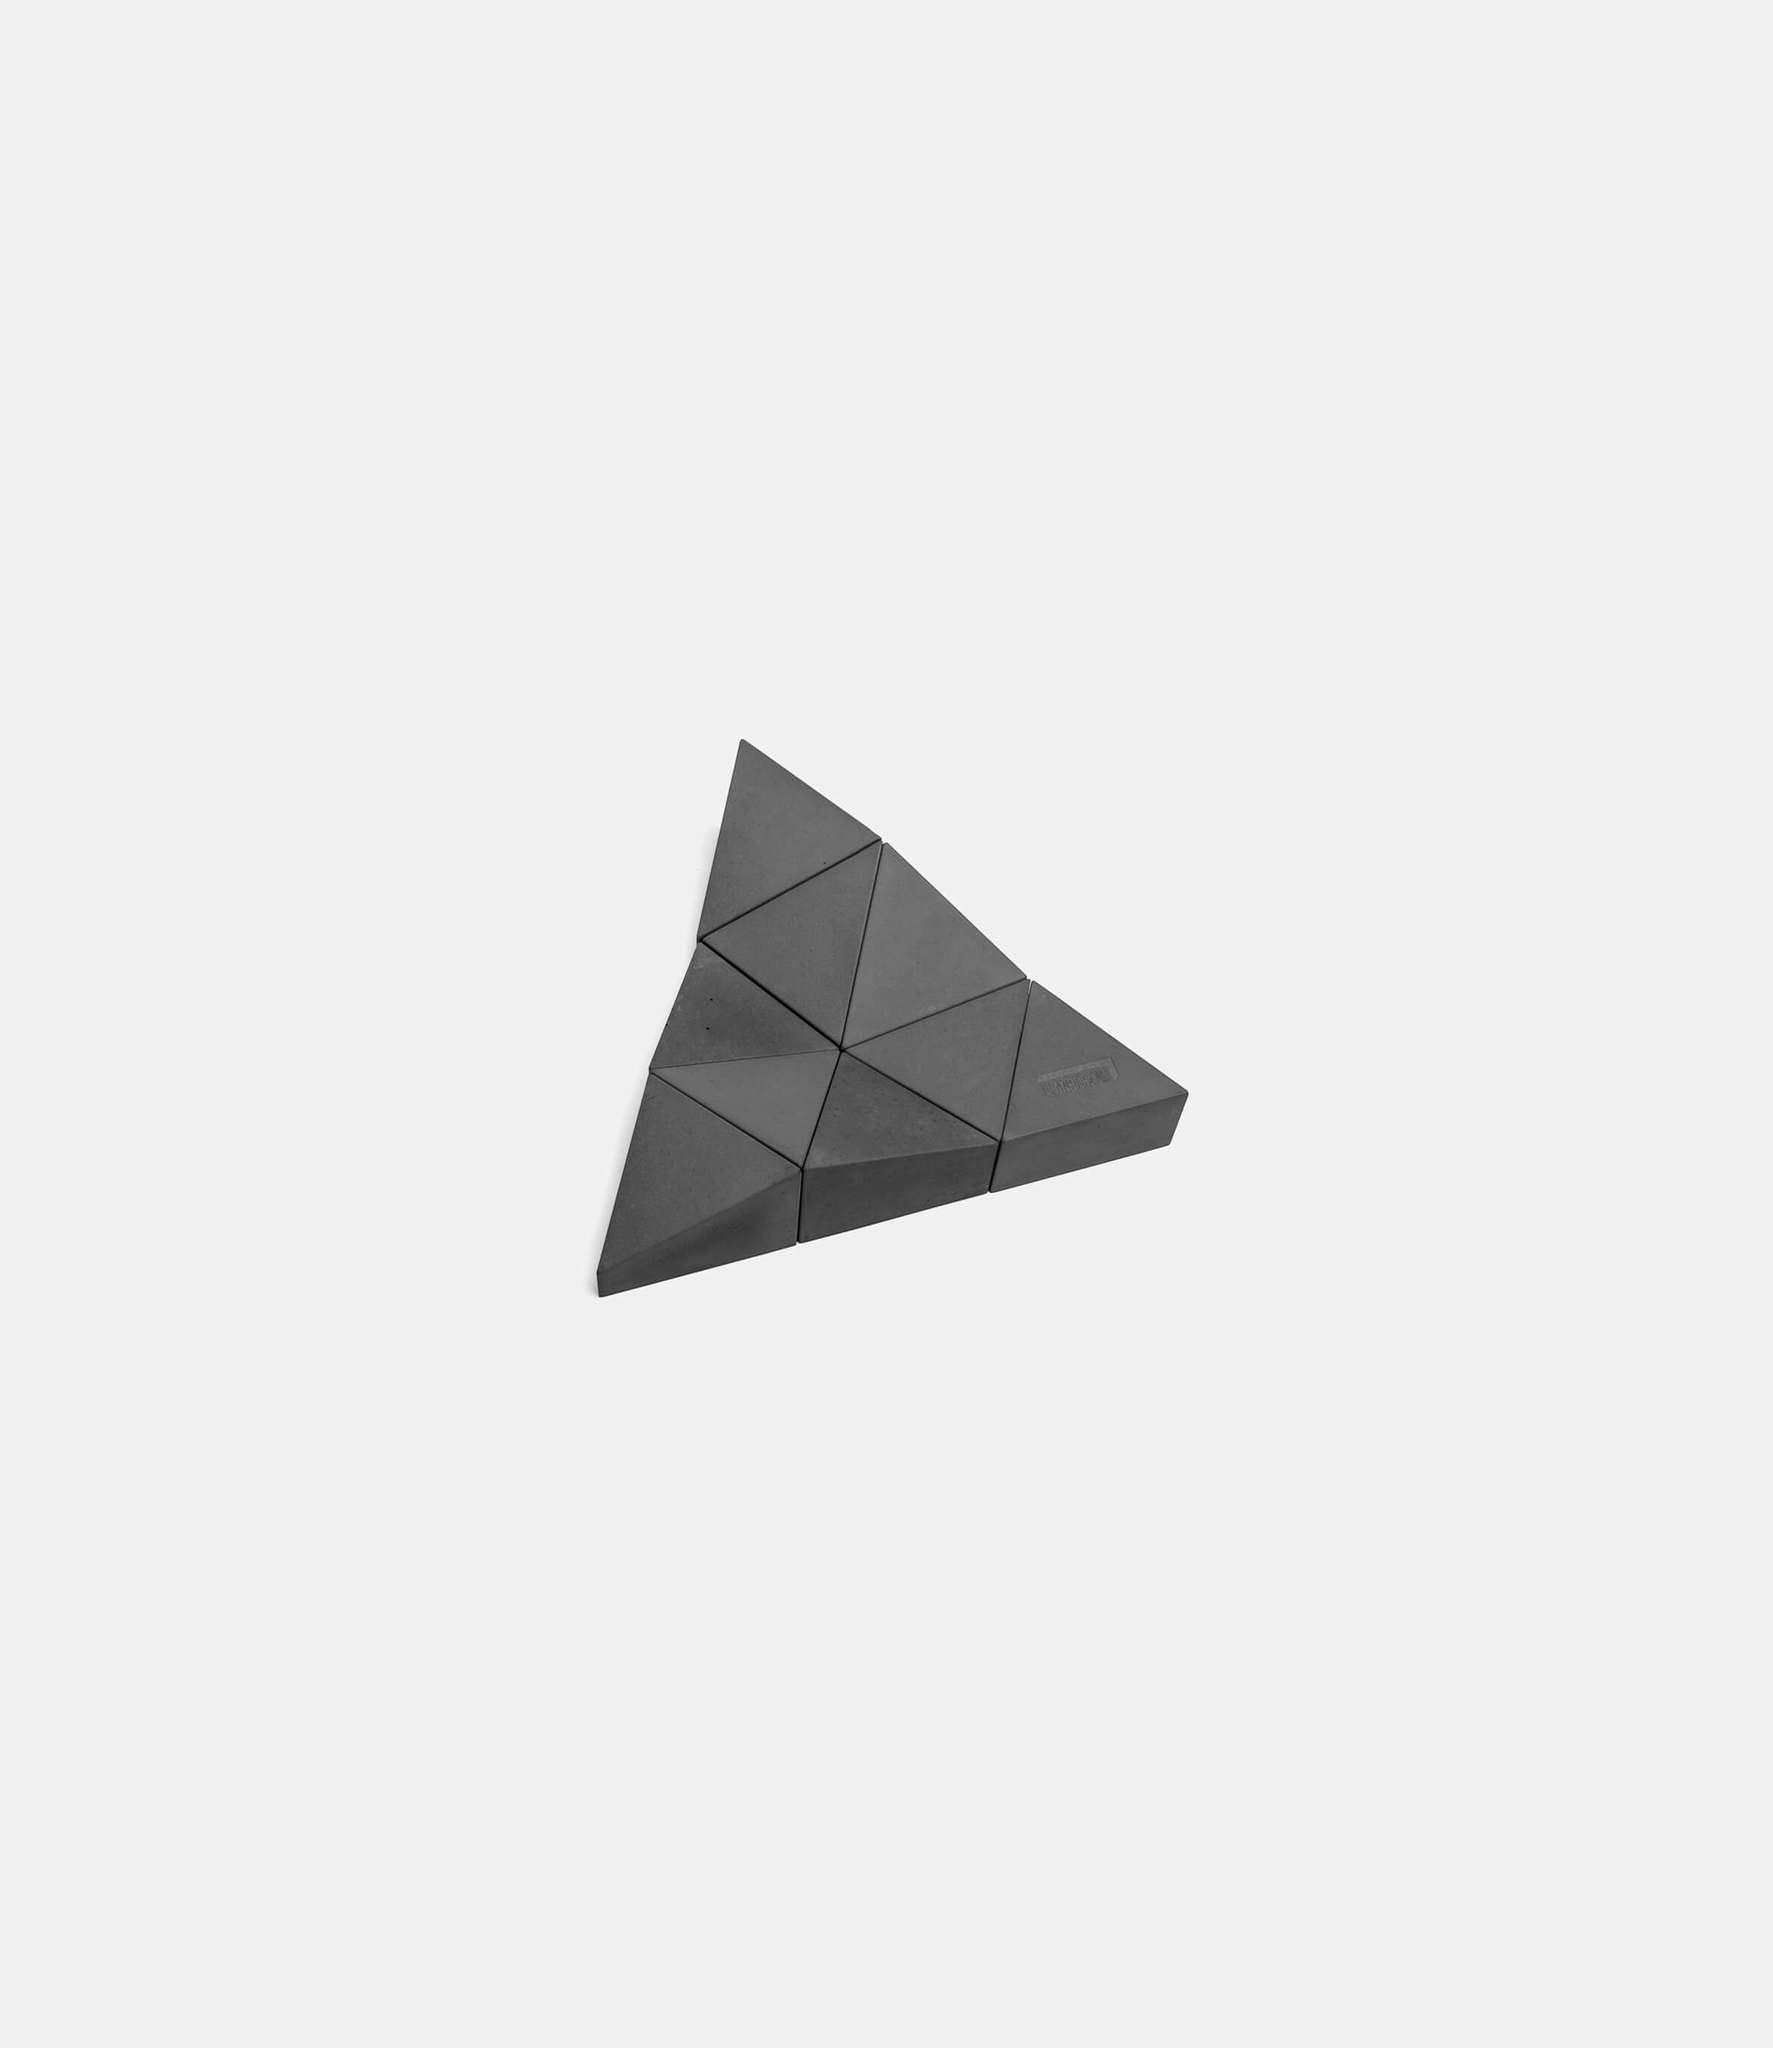 Logideez Logifaces Beginner Set Basalt — пазл из бетона: серый базальт